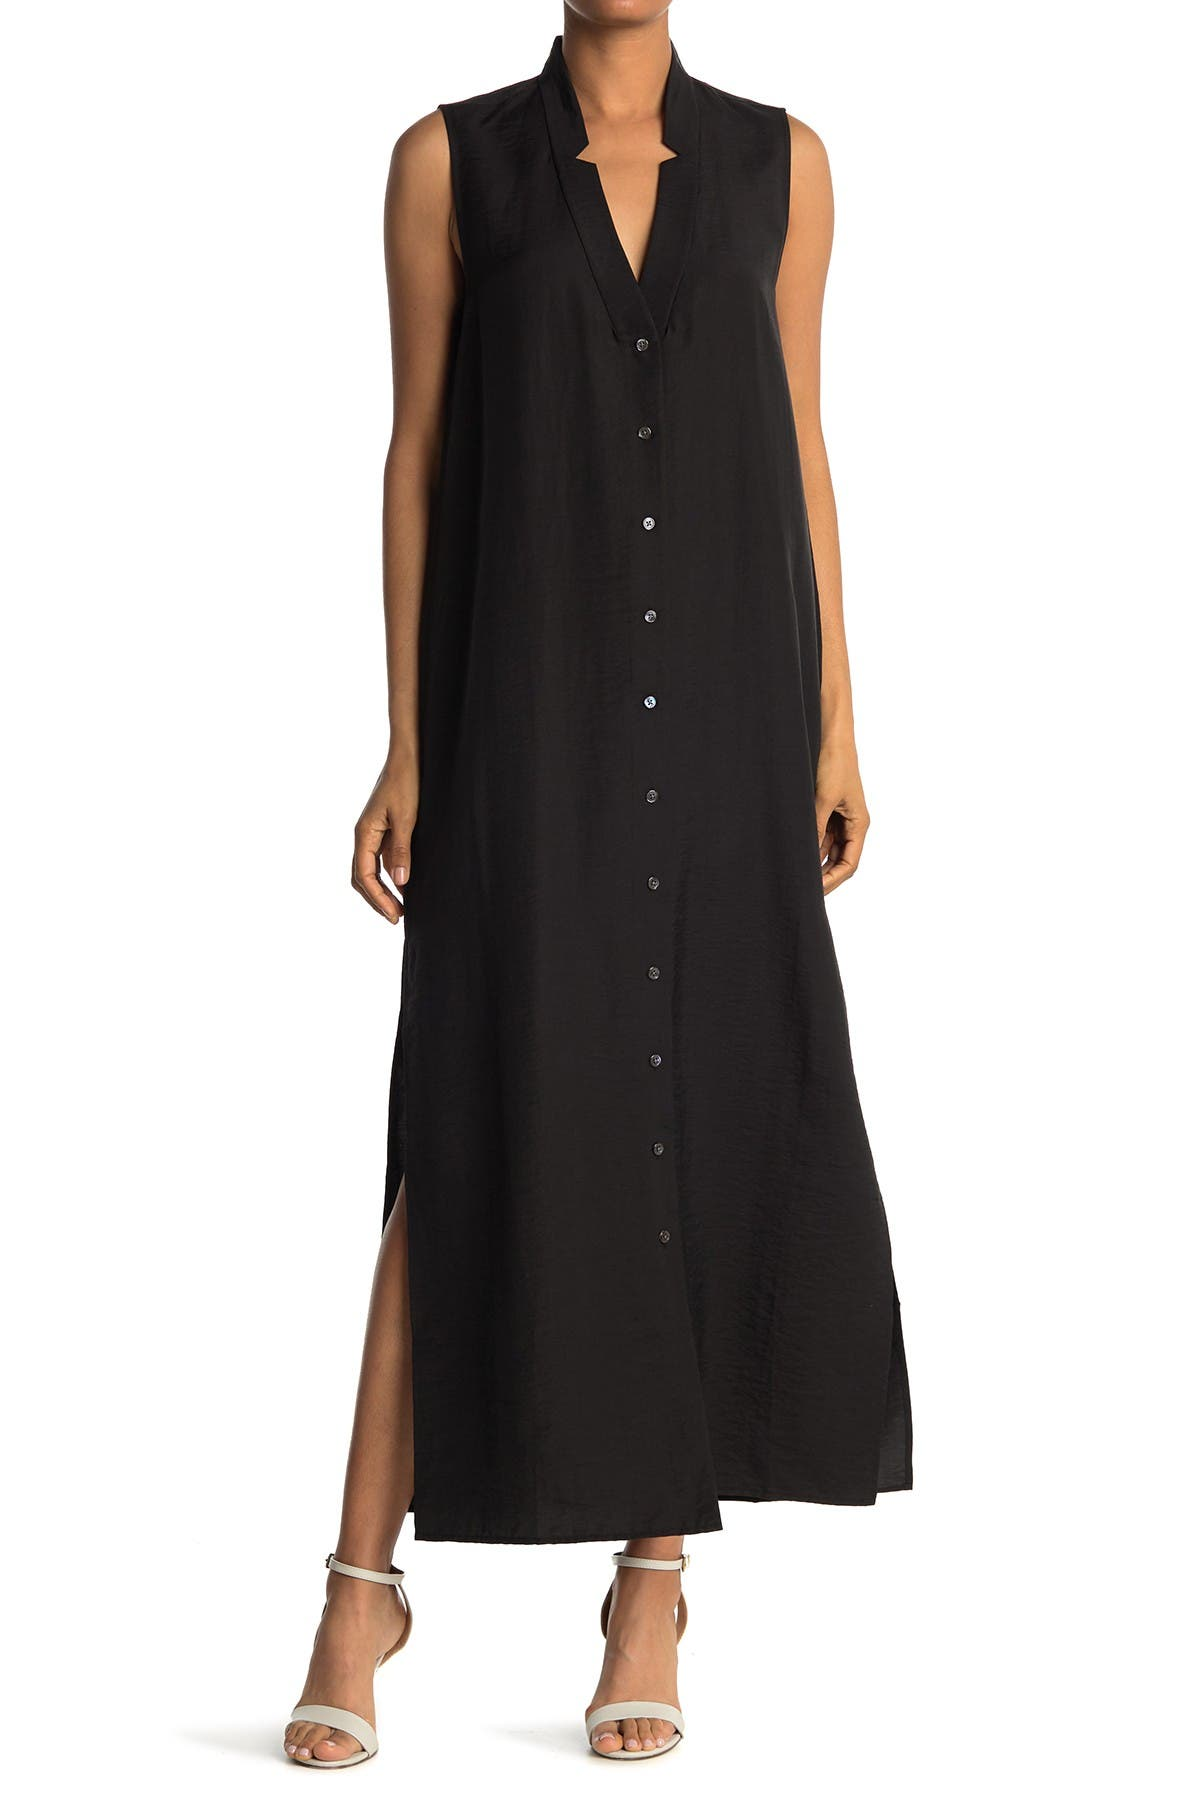 Image of BALDWIN Brock Maxi Dress